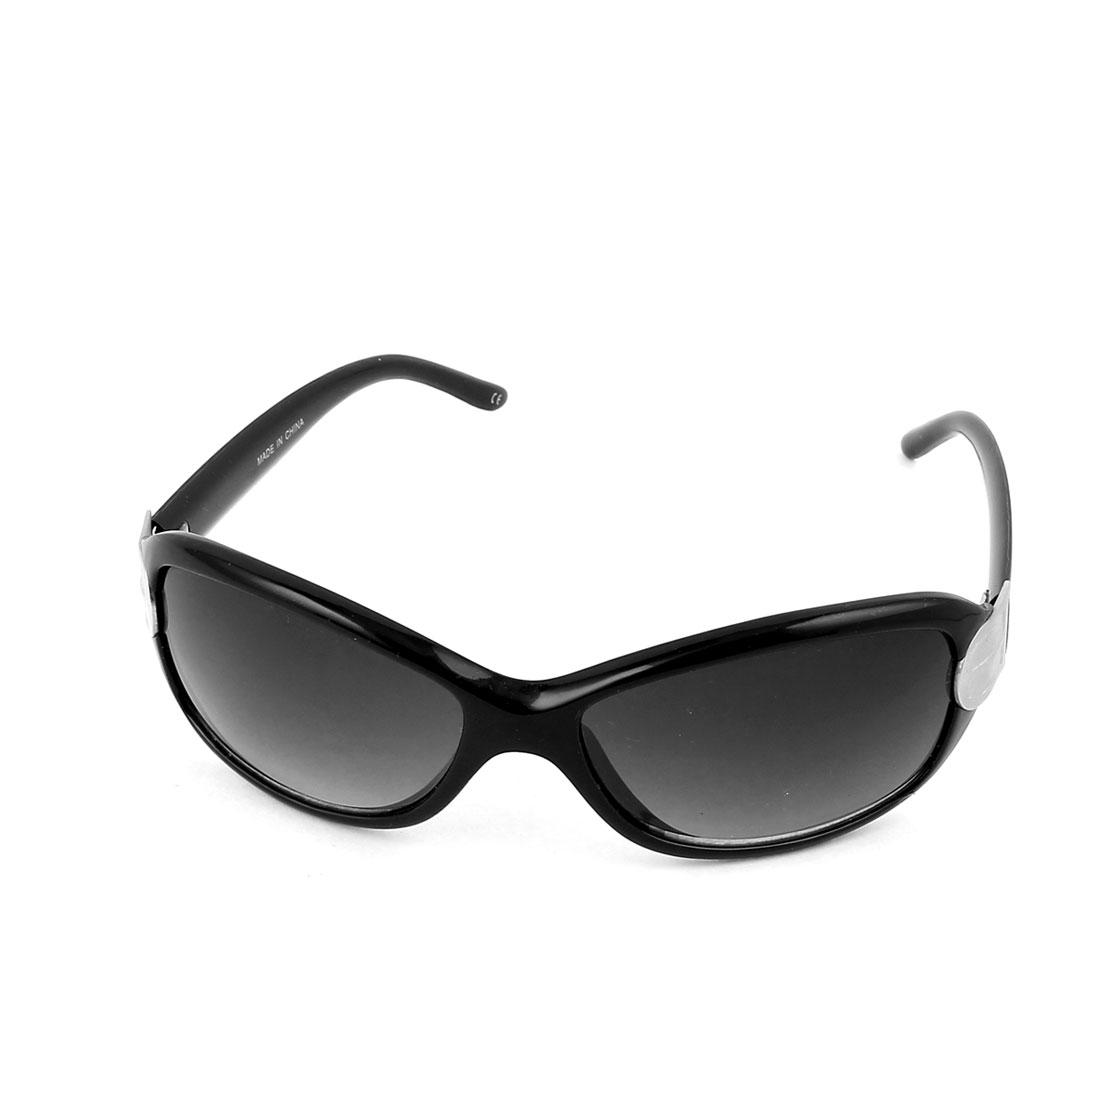 Lady Women Full Frame Sunglasses Outdoor Eyewear Shades Black